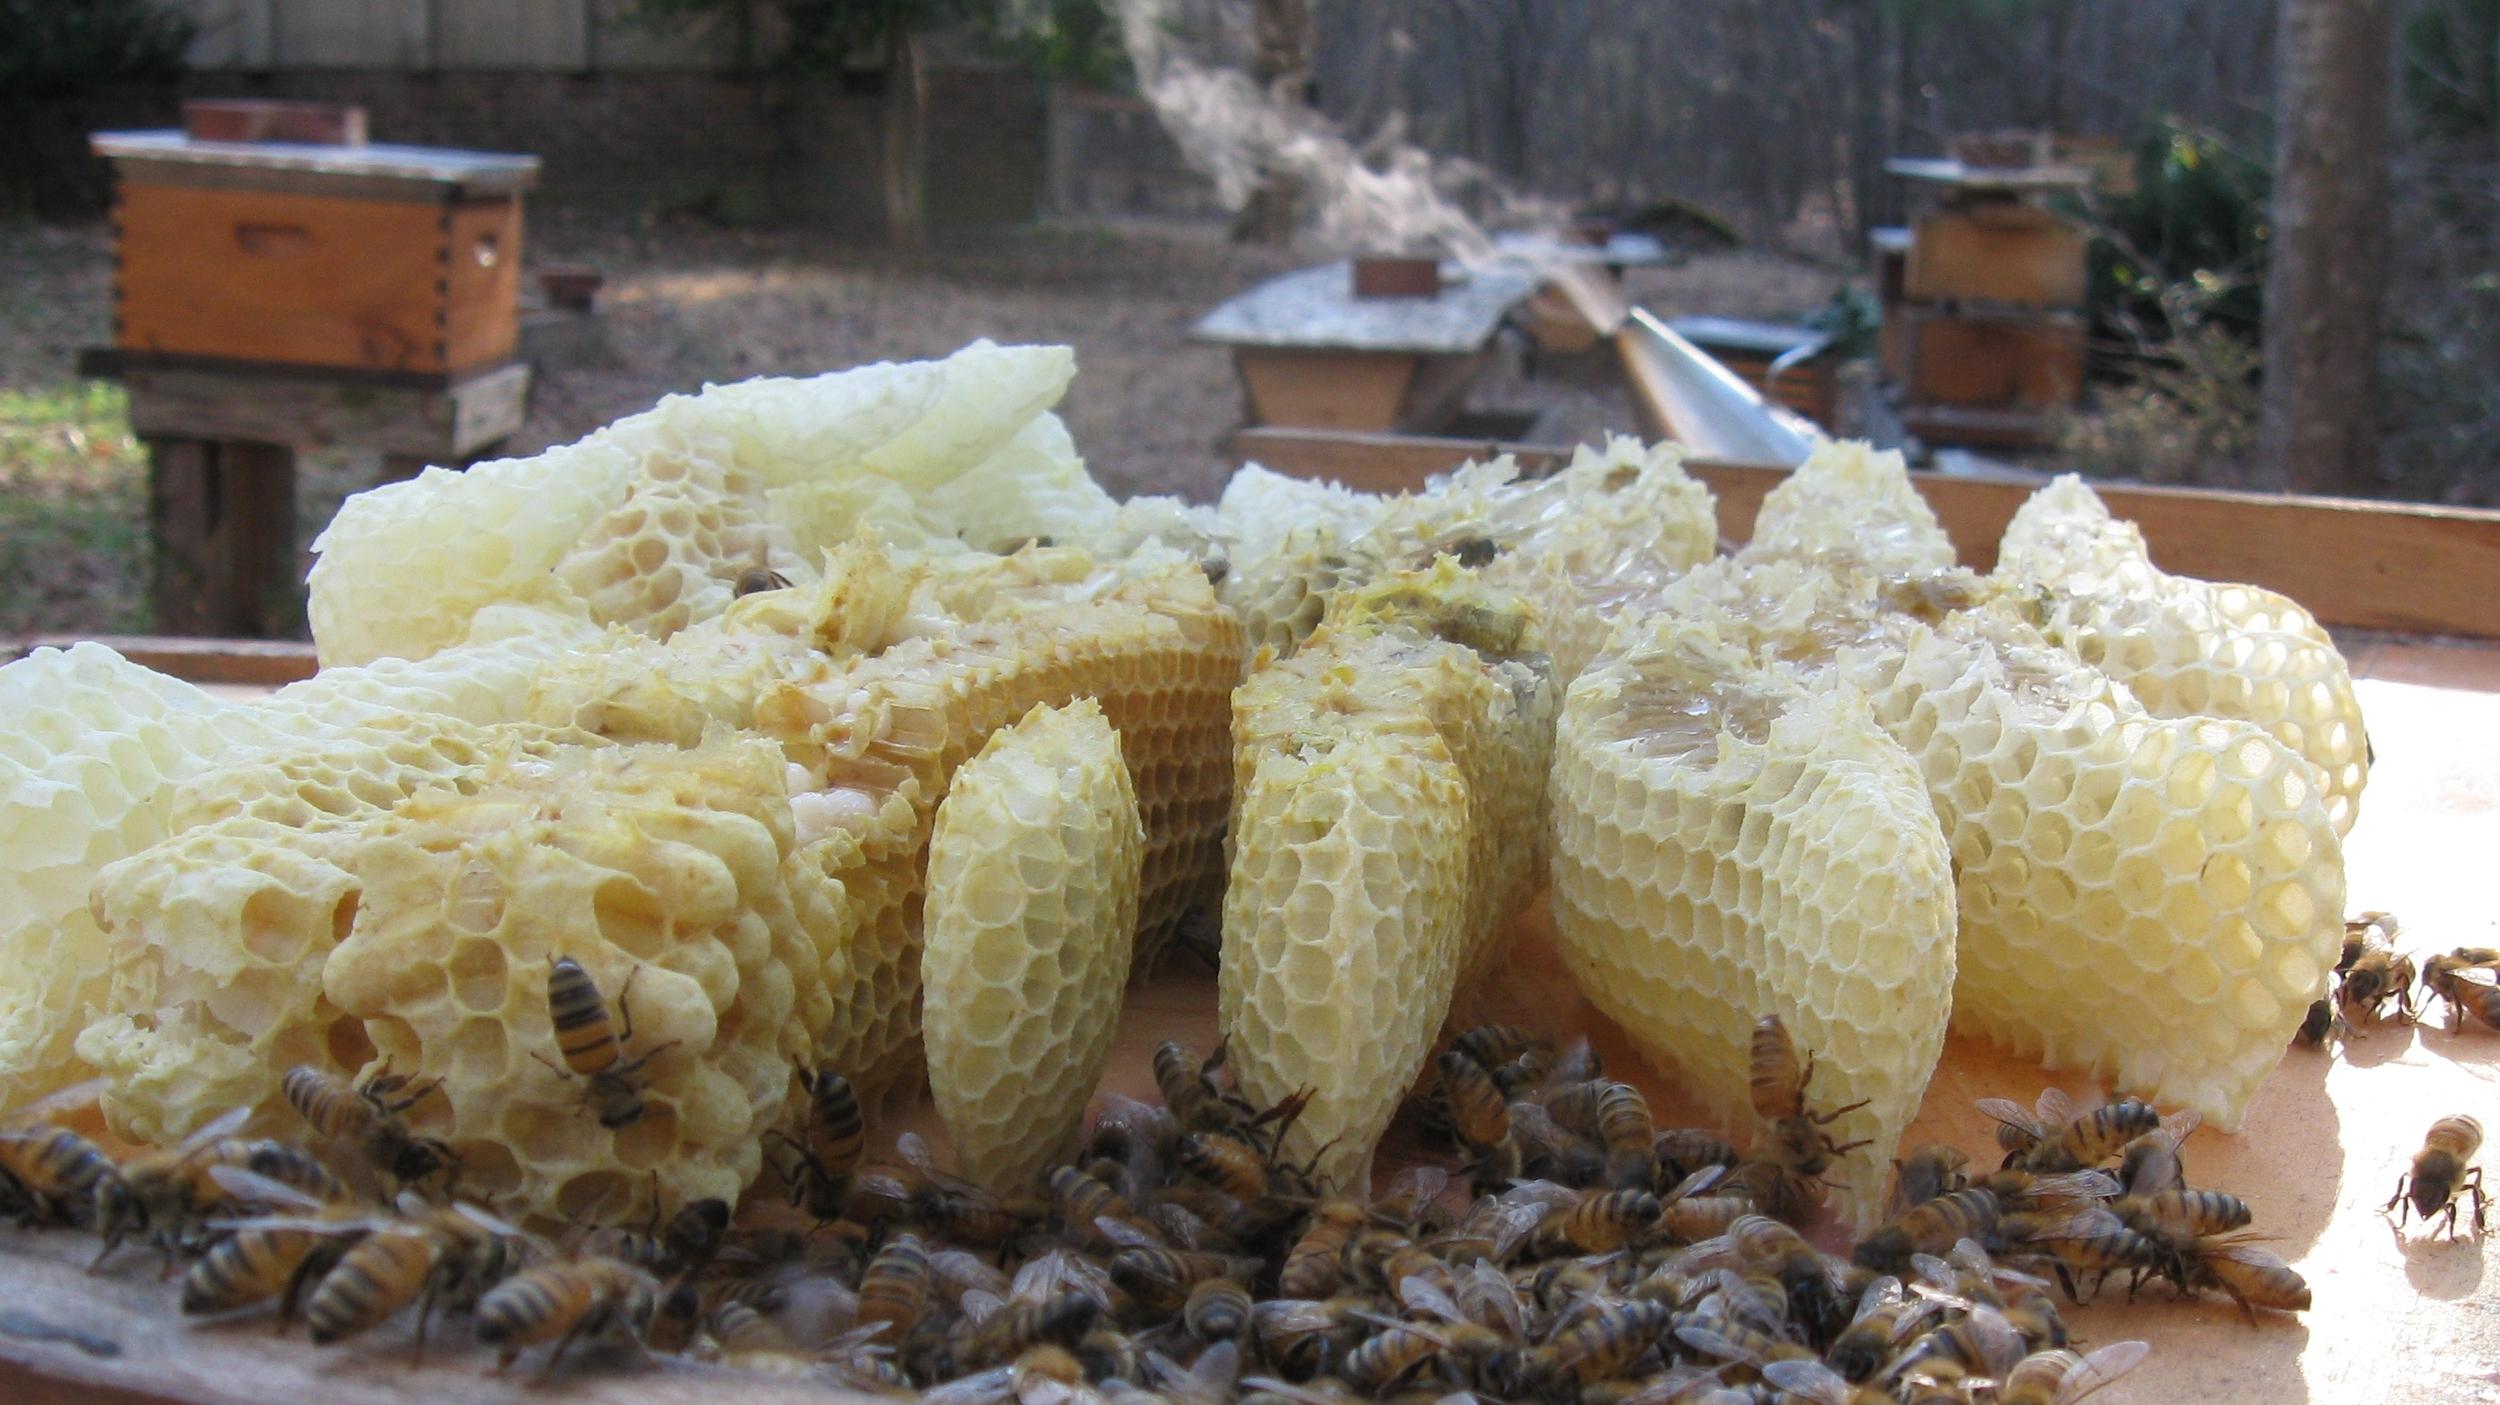 Bees, Burr-comb, and Smoker (c) 2013 The Carolina Bee Company